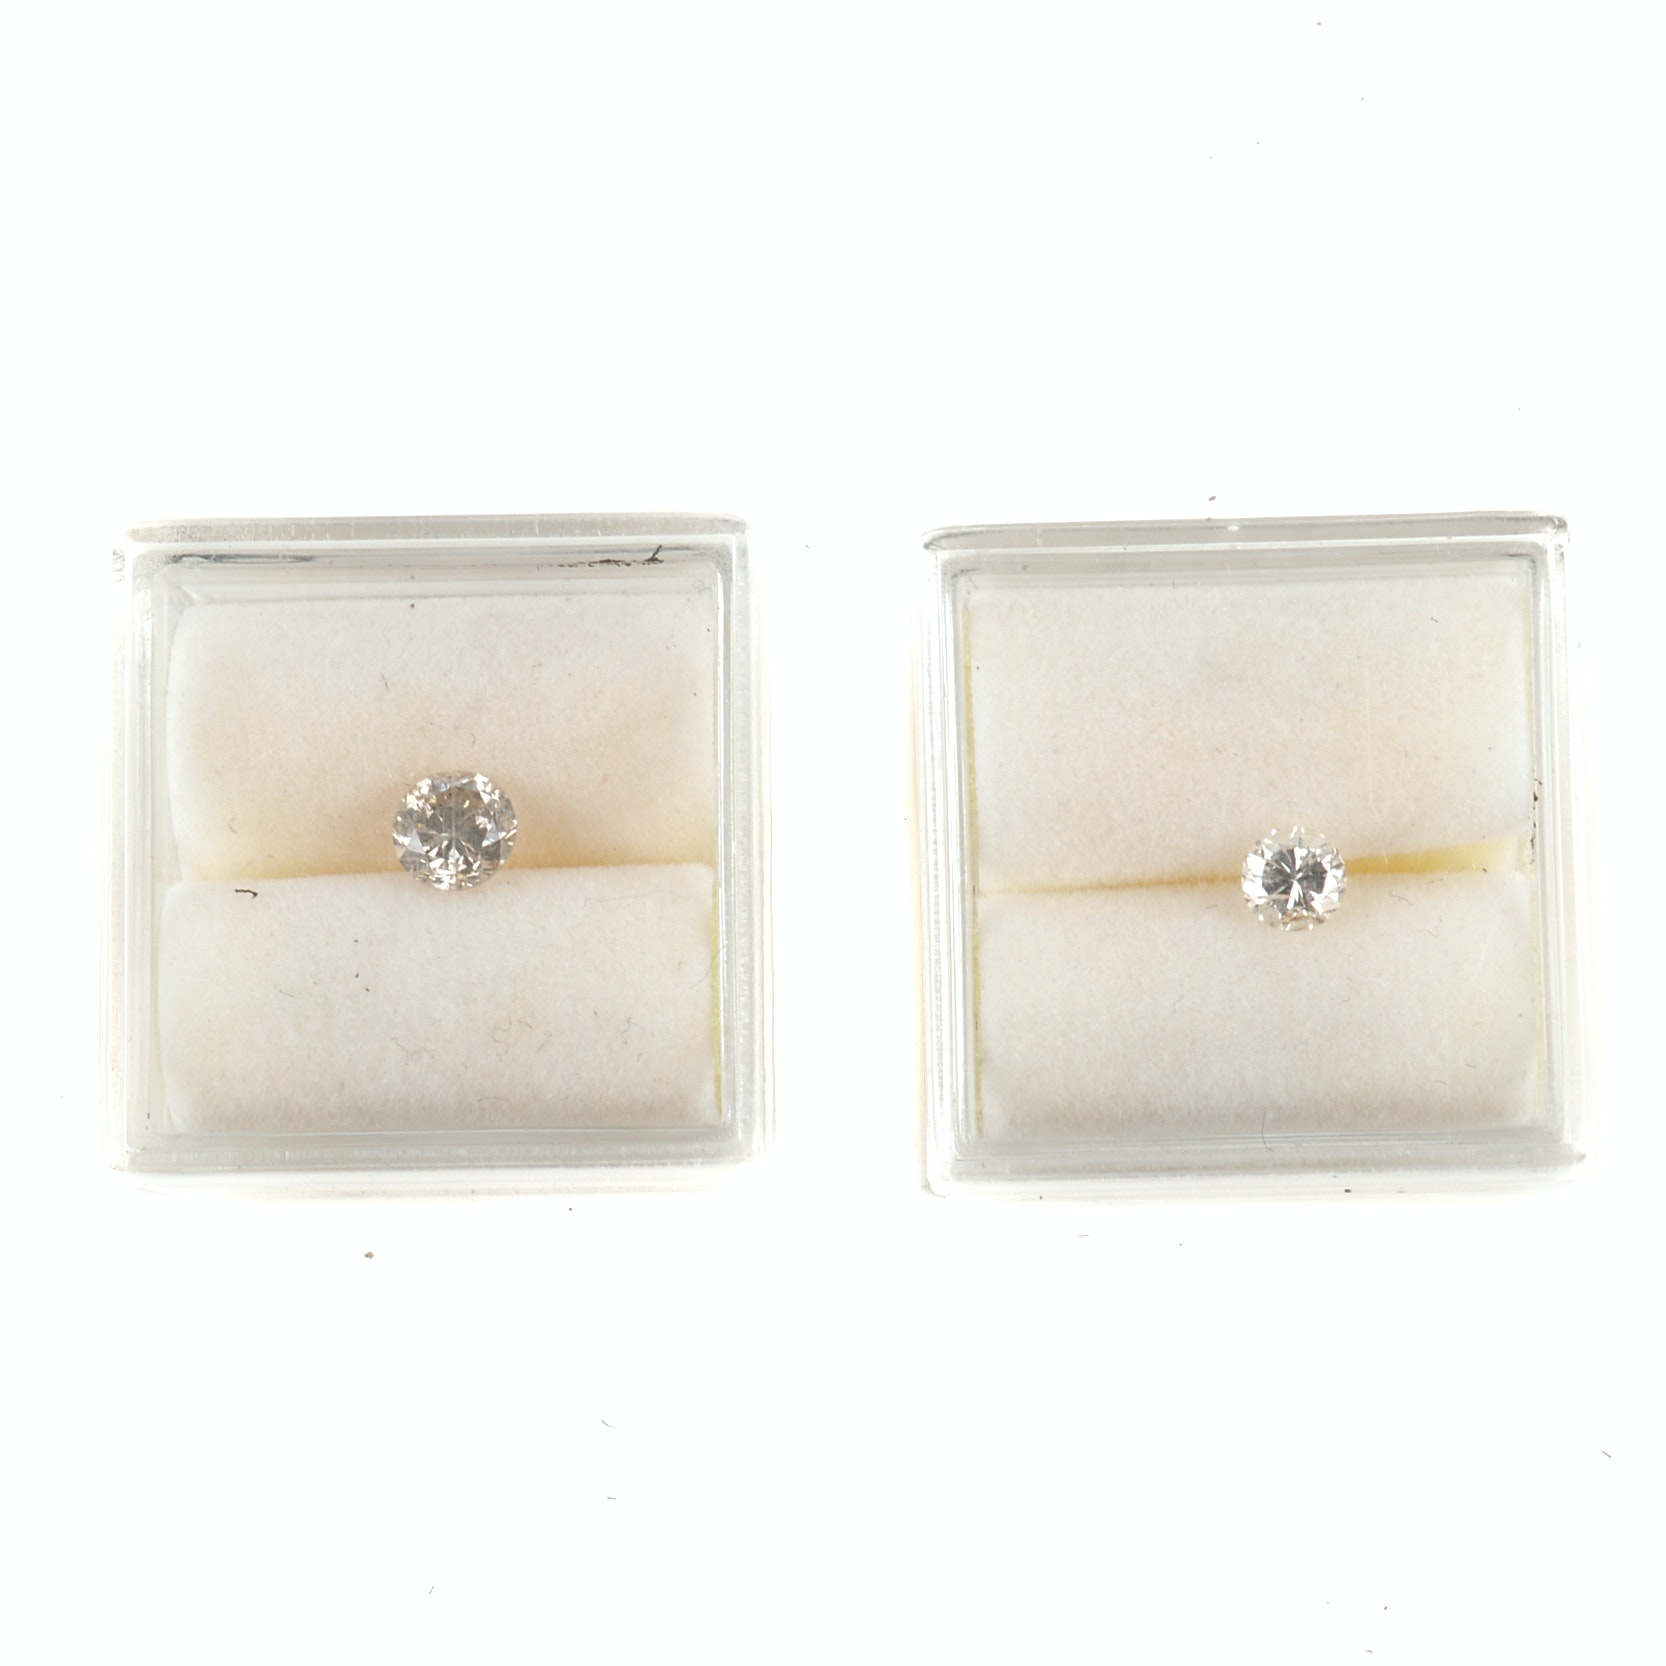 Two Loose Diamonds